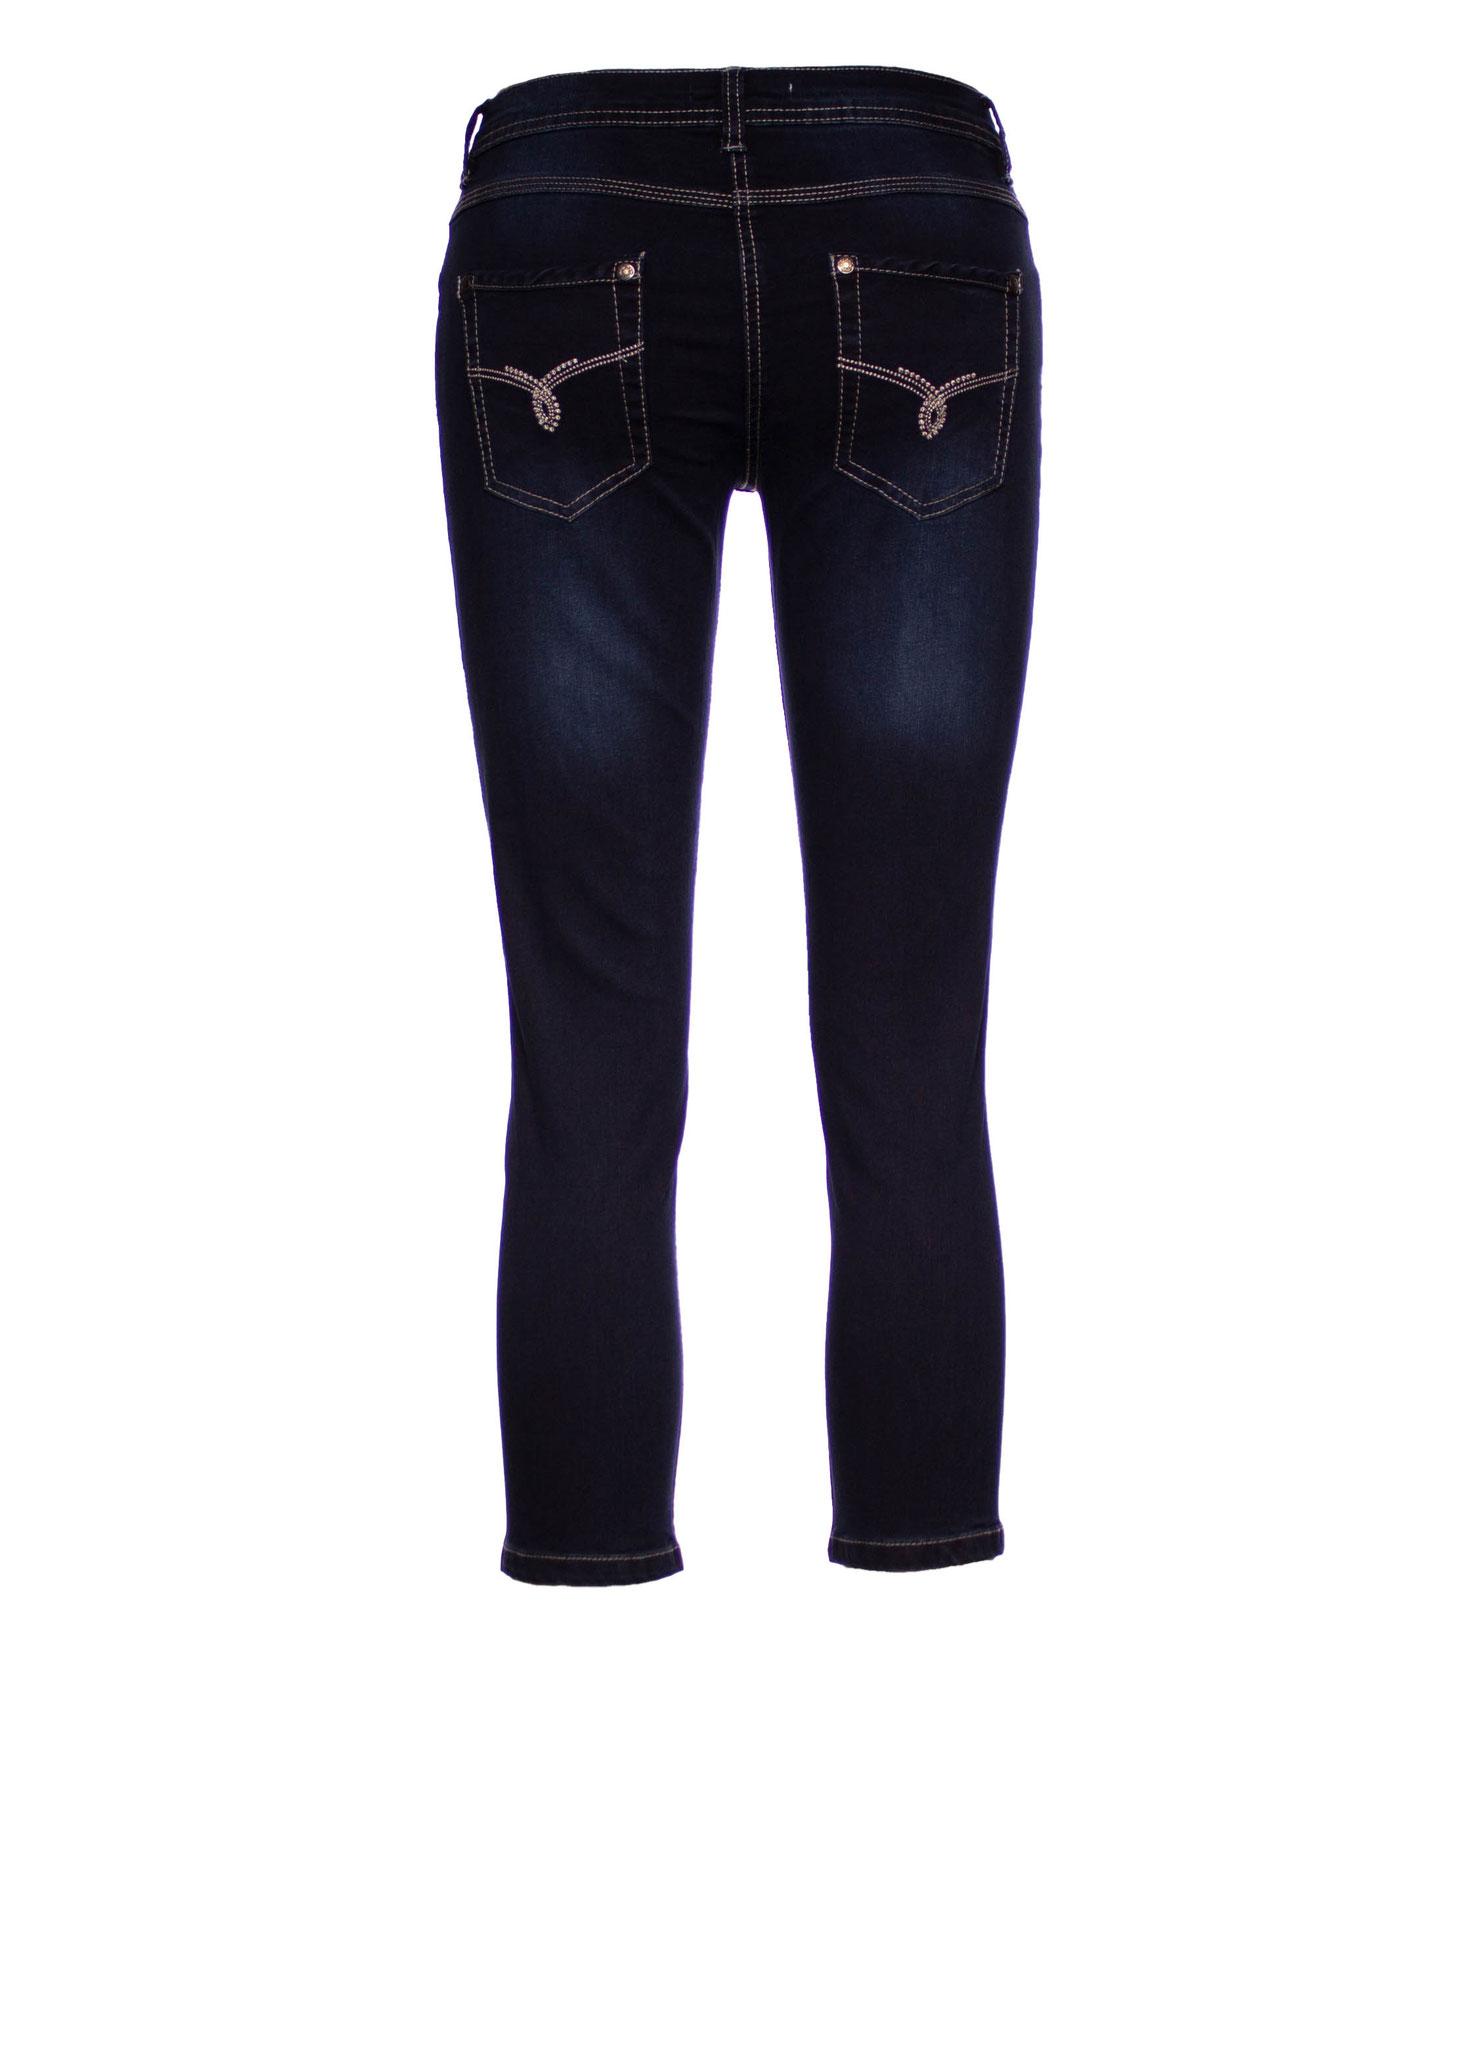 7/8 Hose Jeans 34,99€